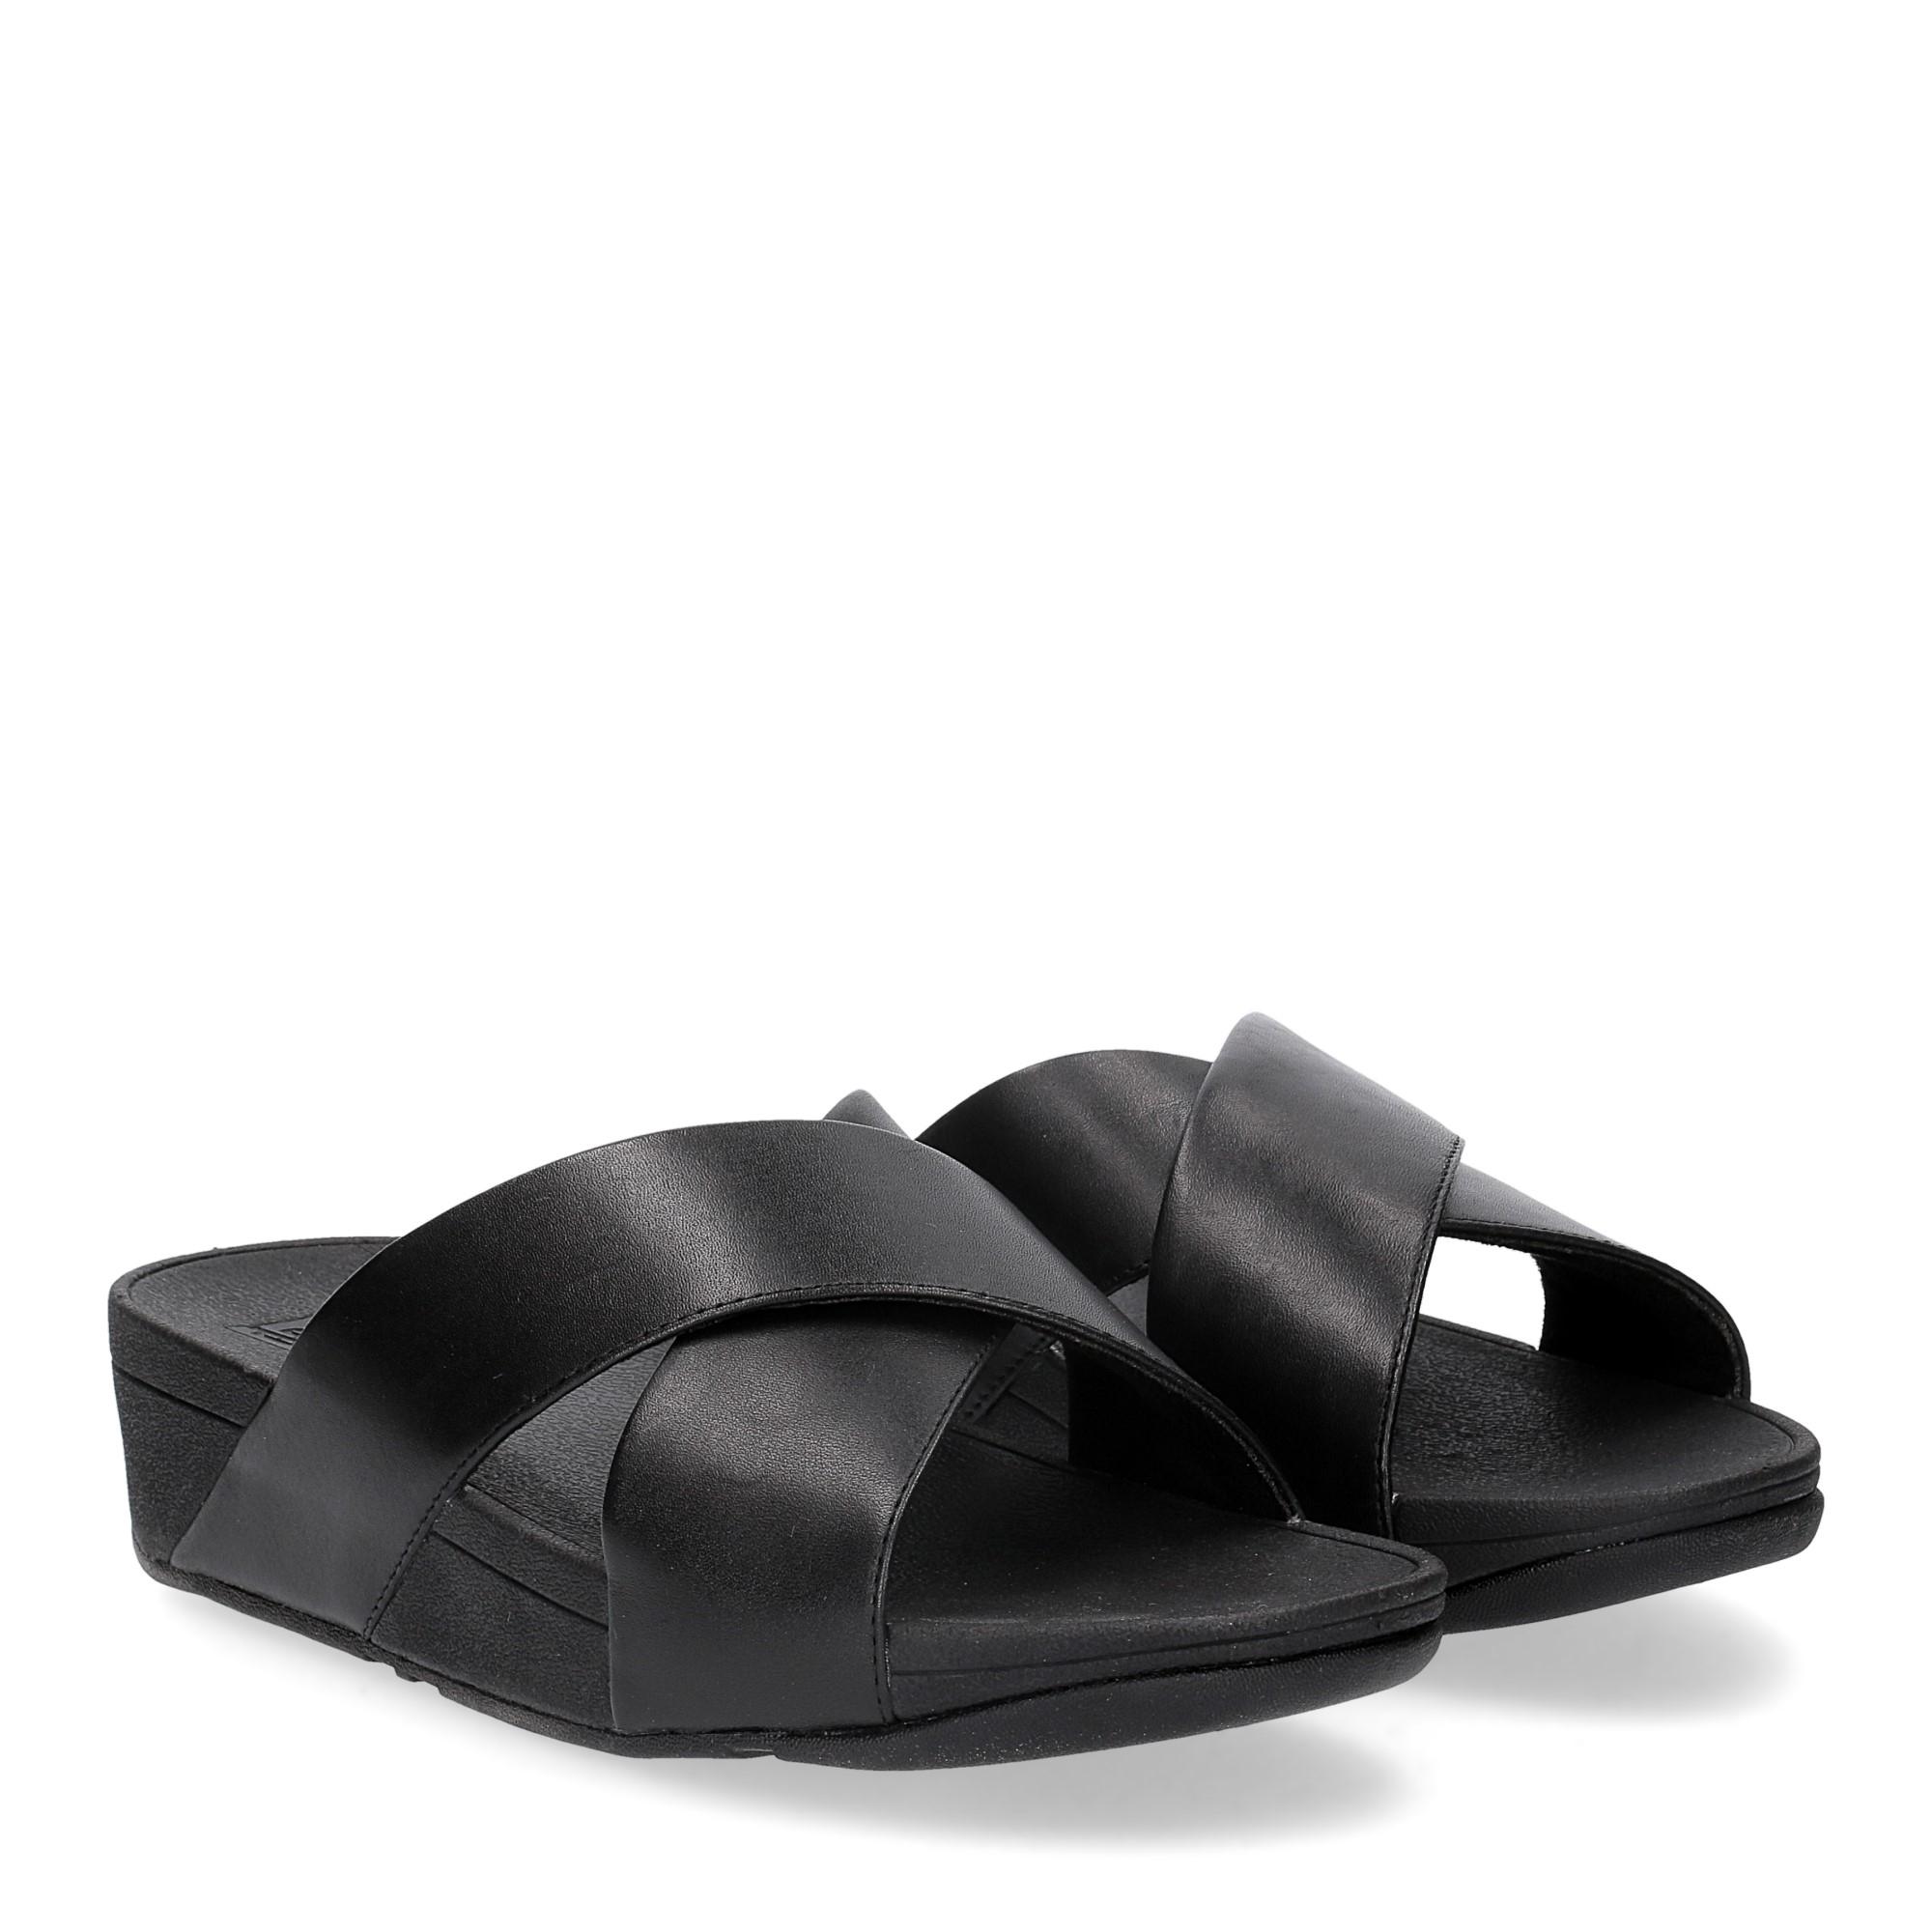 Fitflop LULU CROSS SLIDE SANDALS leather black